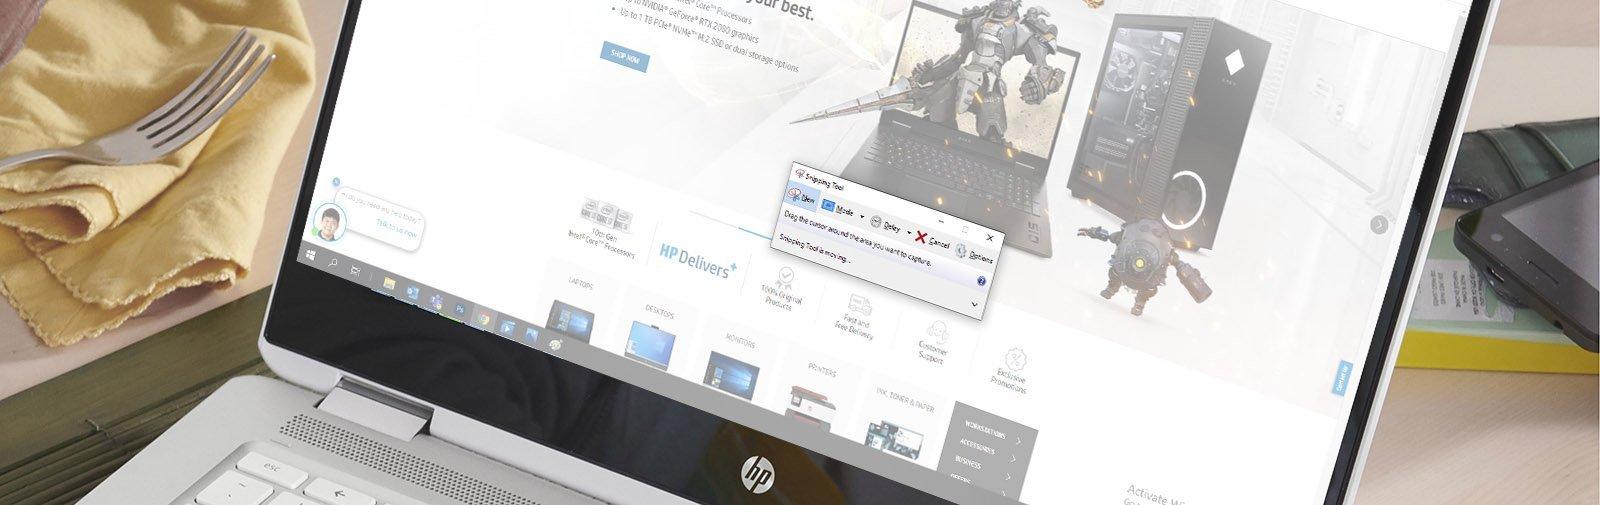 How Do I Print Screen on My PC